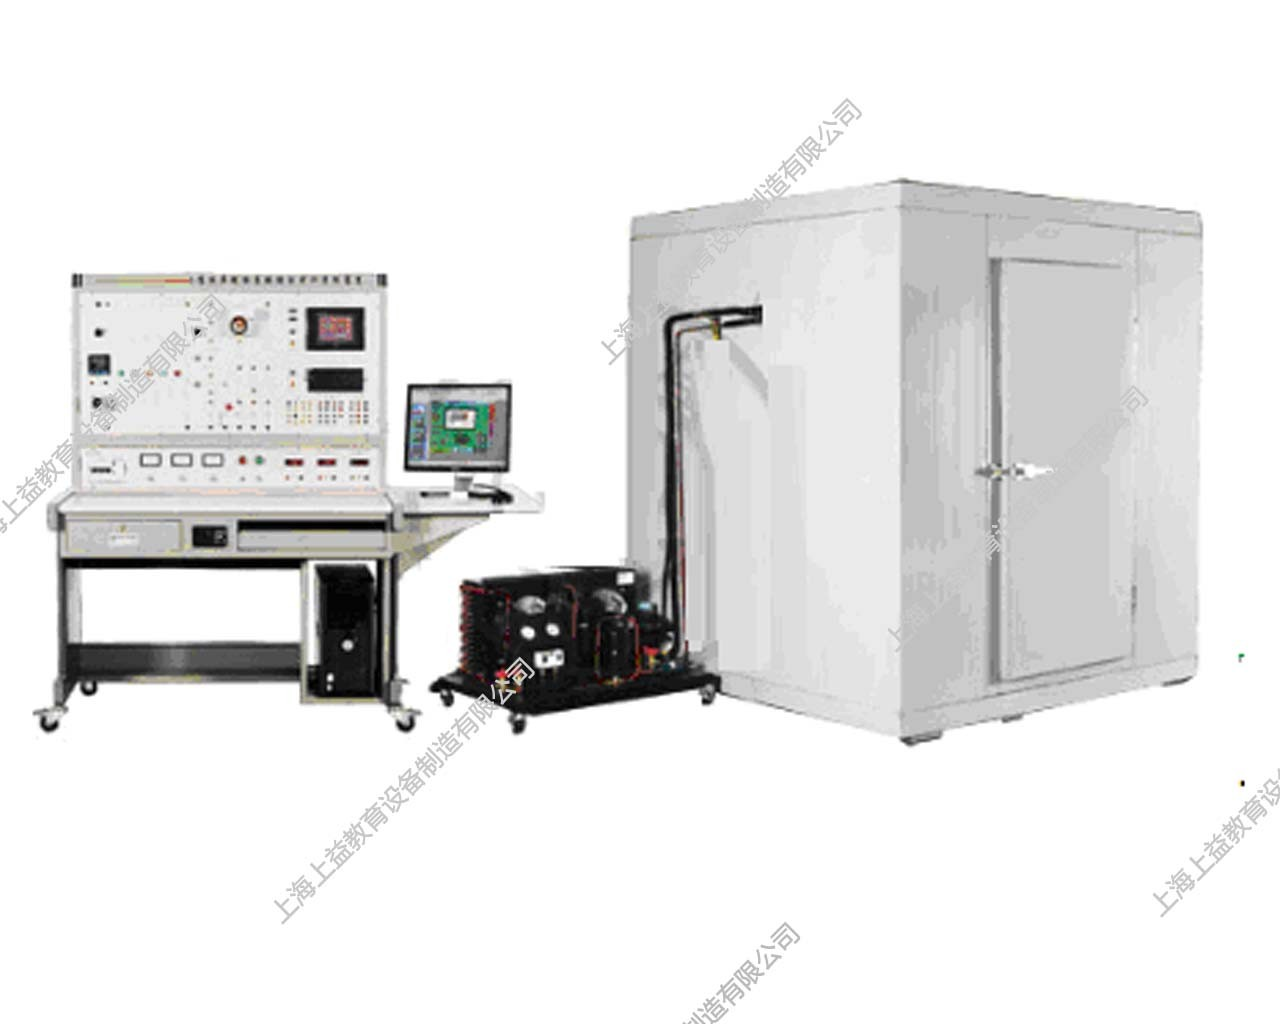 SYZLRX-86型 小型冷库制冷系统综合wwwlehu8viplehu68vip装置